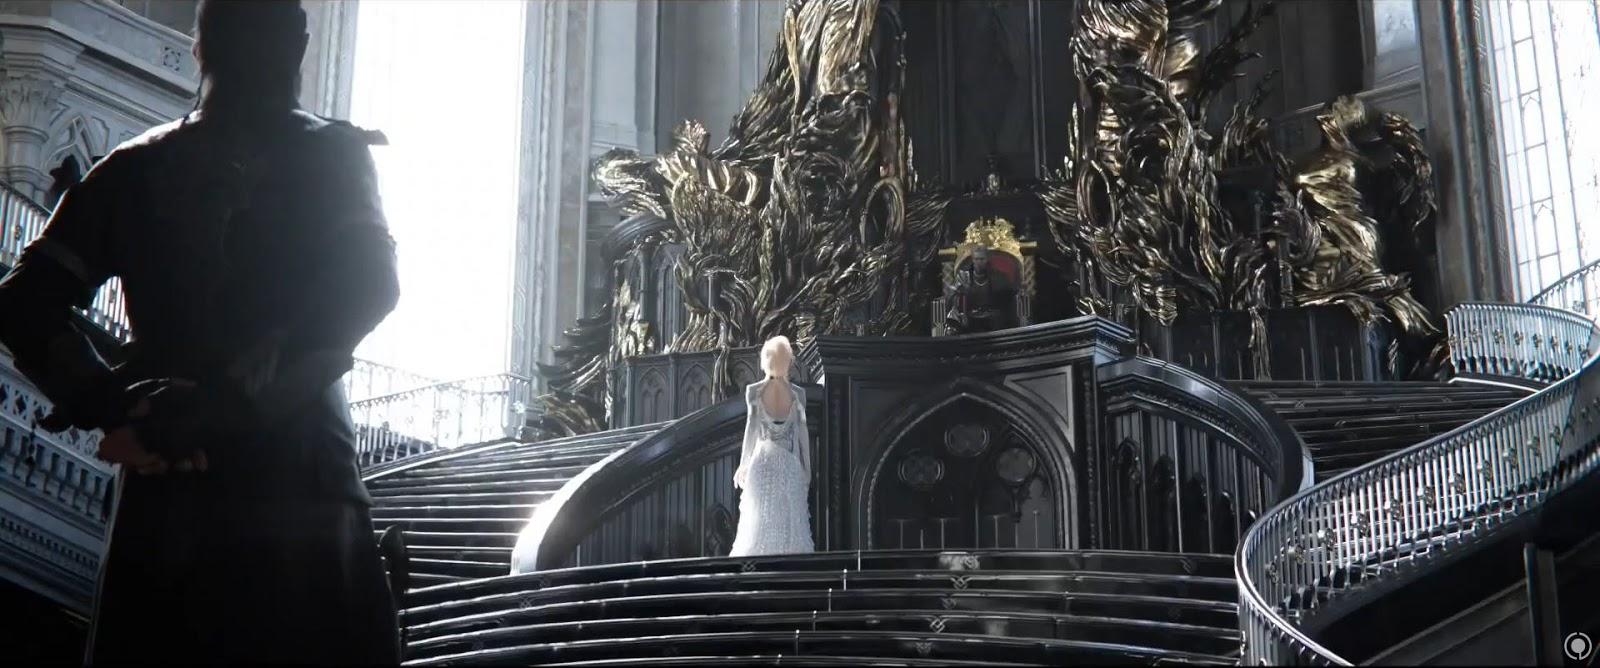 Final fantasy xv cgi movie kingsglaive trailer cg daily for Final fantasy 8 architecture